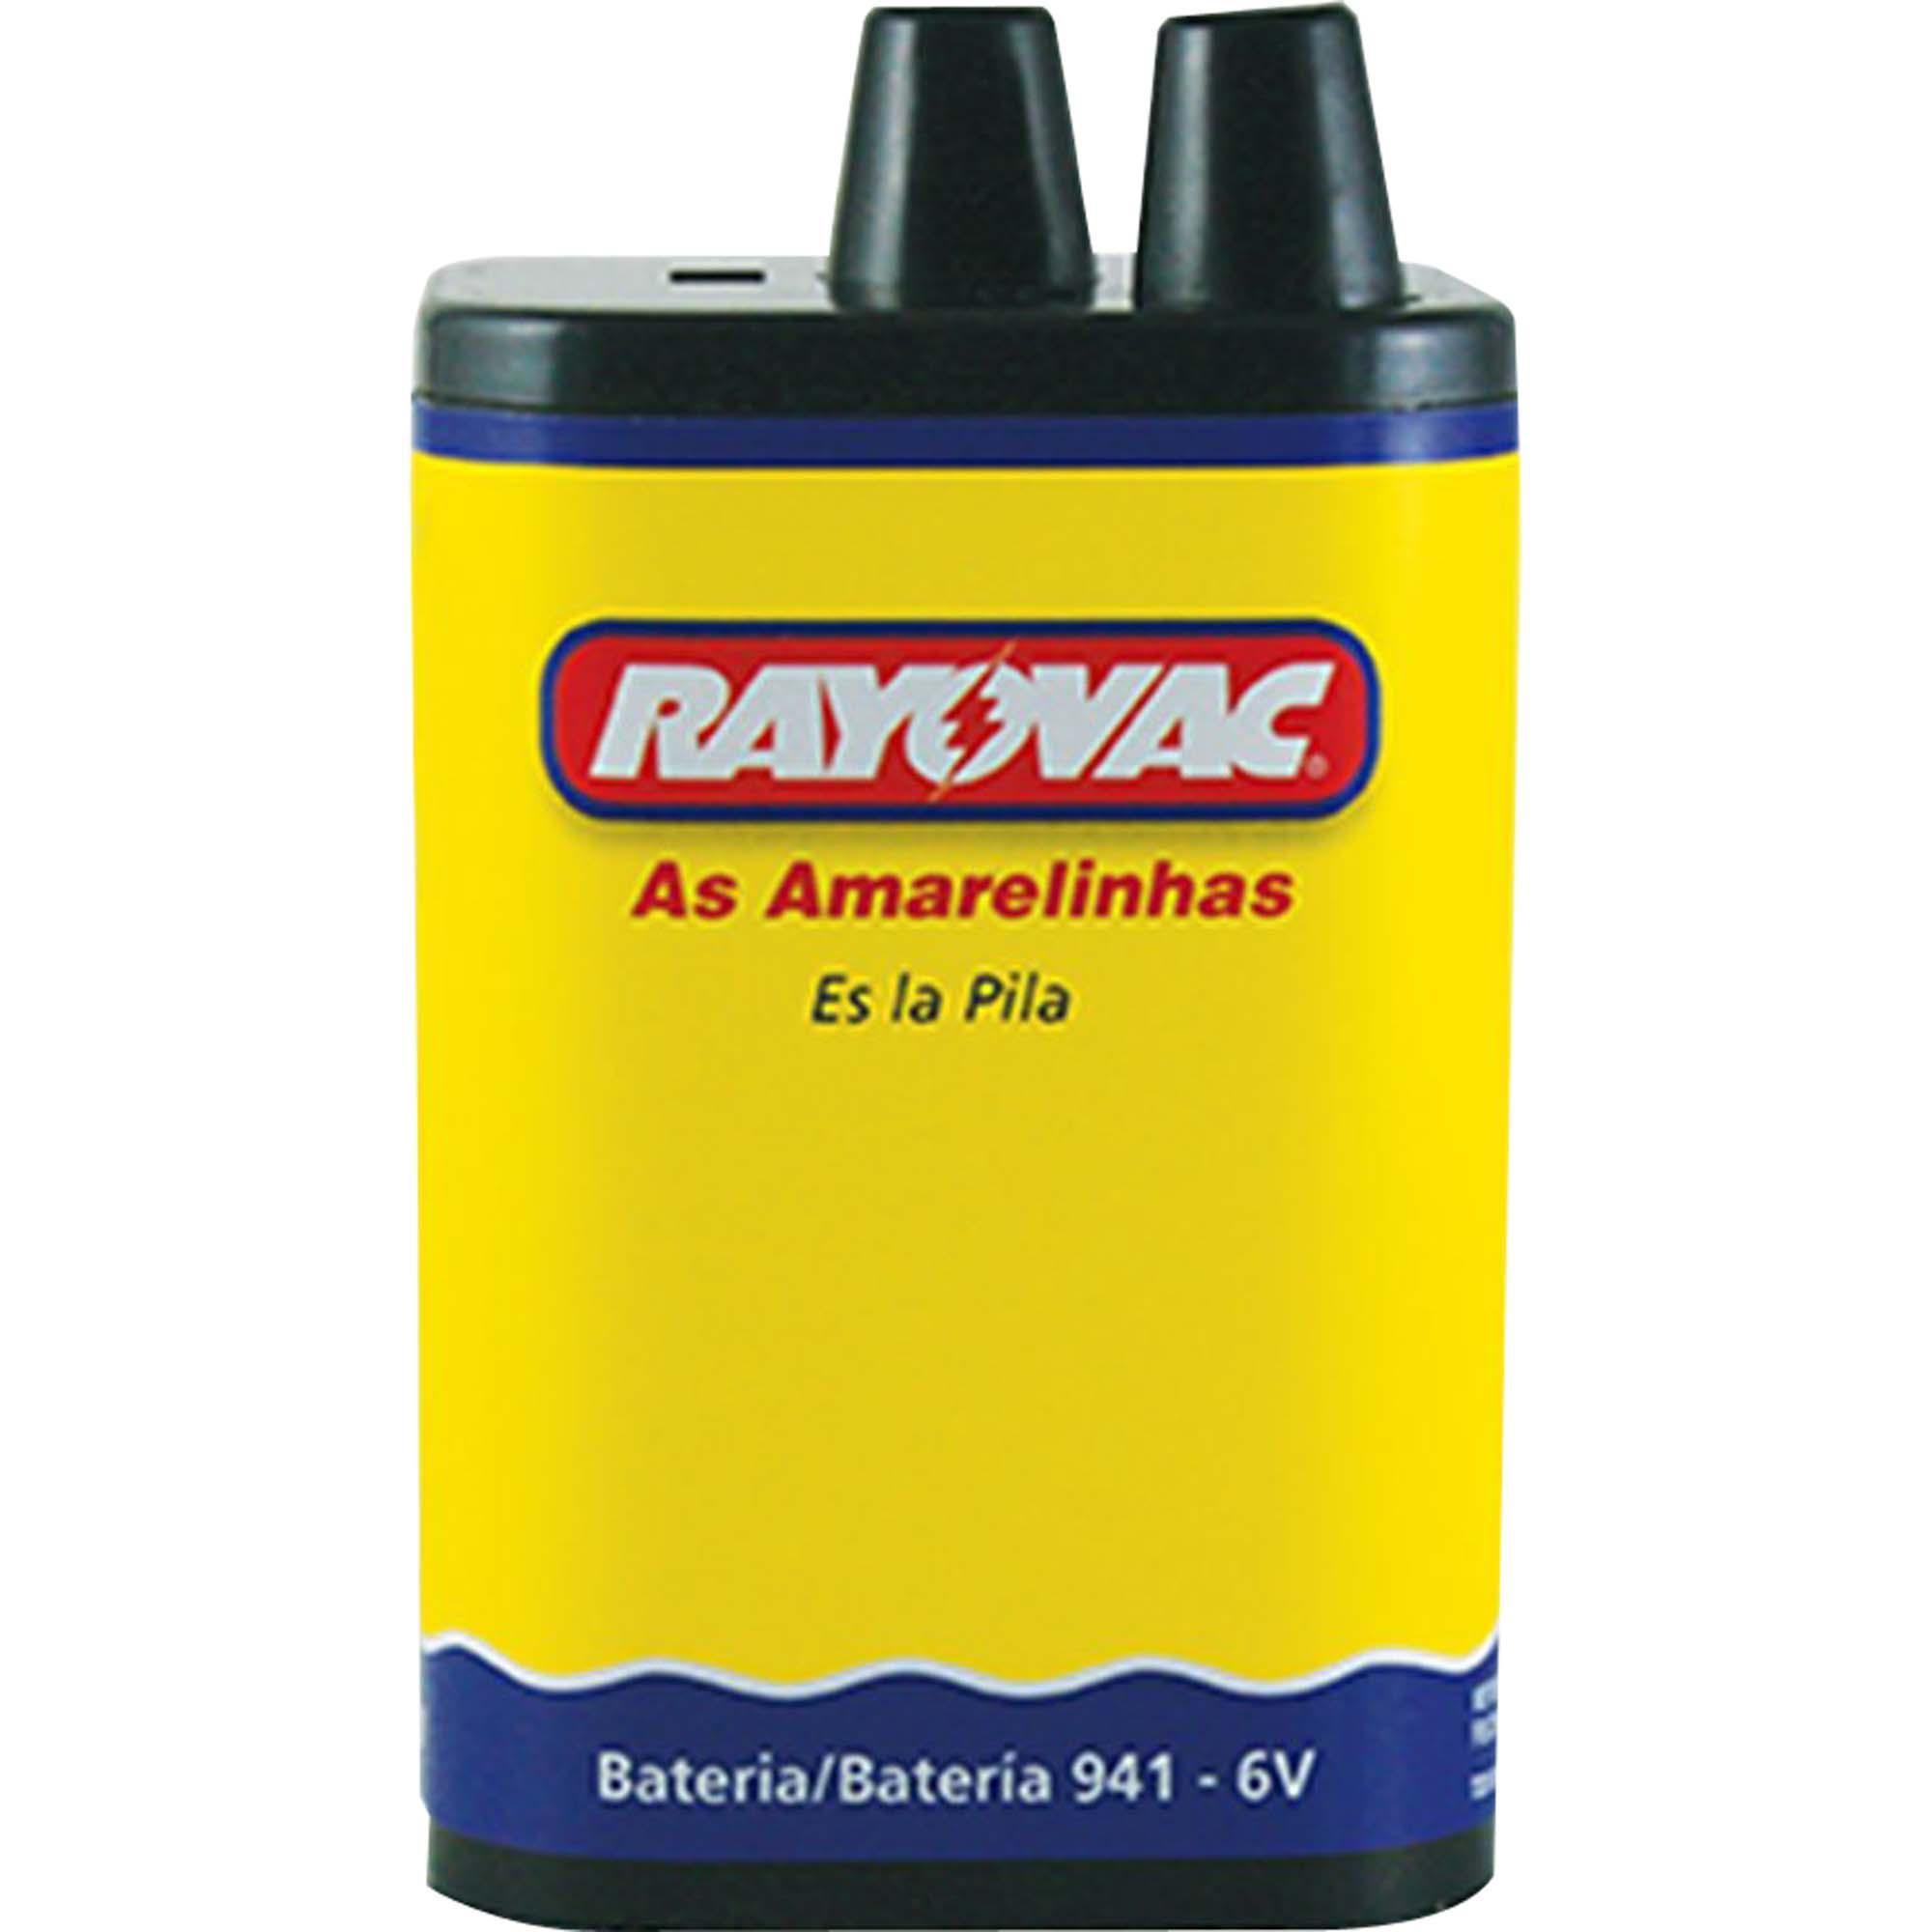 Bateria P/ Lanterna 941 6 Volts - Rayovac